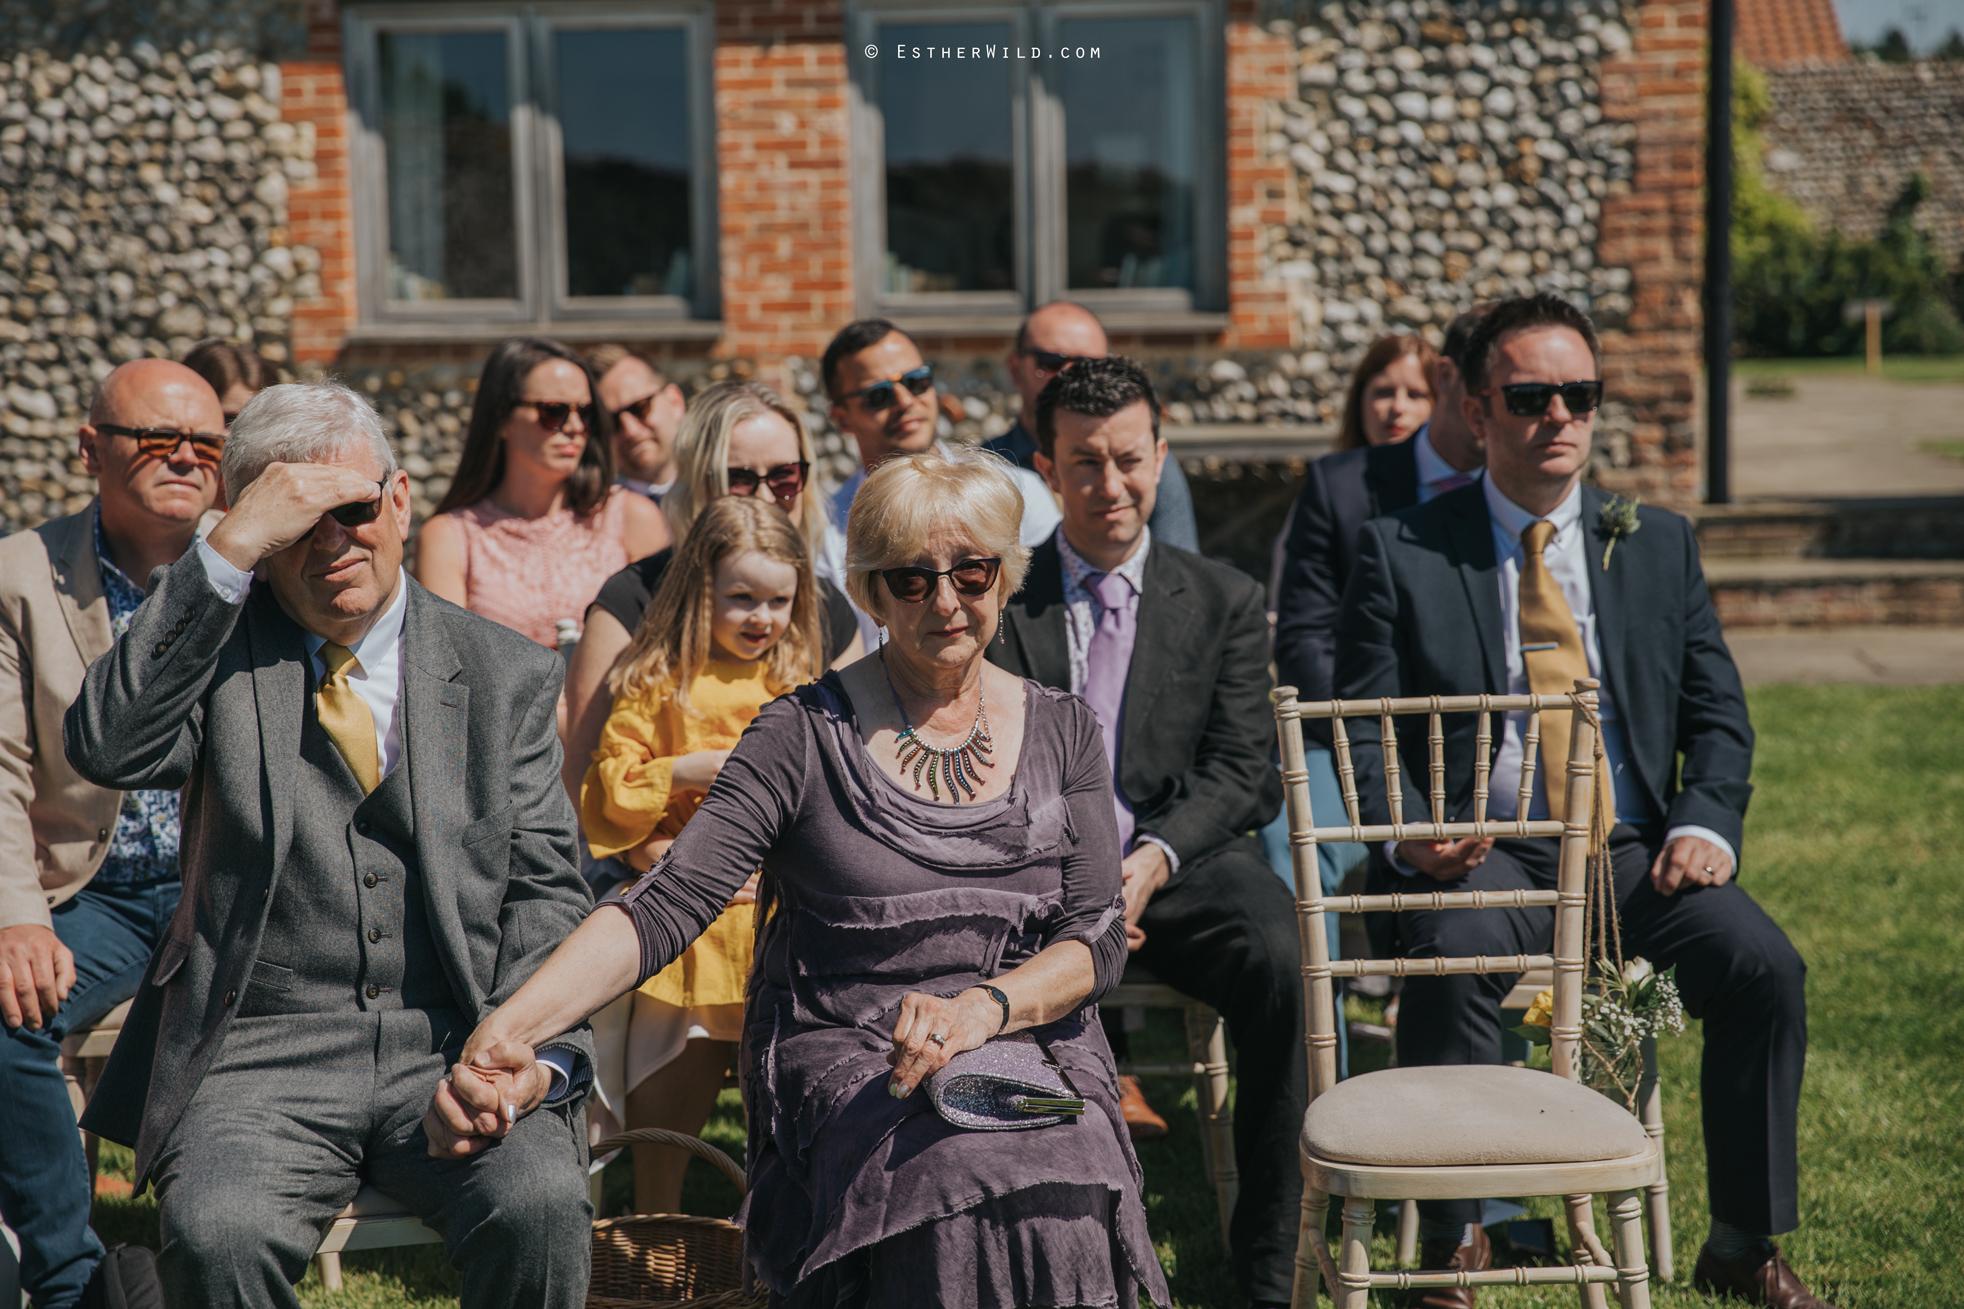 IMG_0530Cley_Barn_Drift_Norfolk_Coast_Wedding_Copyright_Esther_Wild_Photographer_.jpg